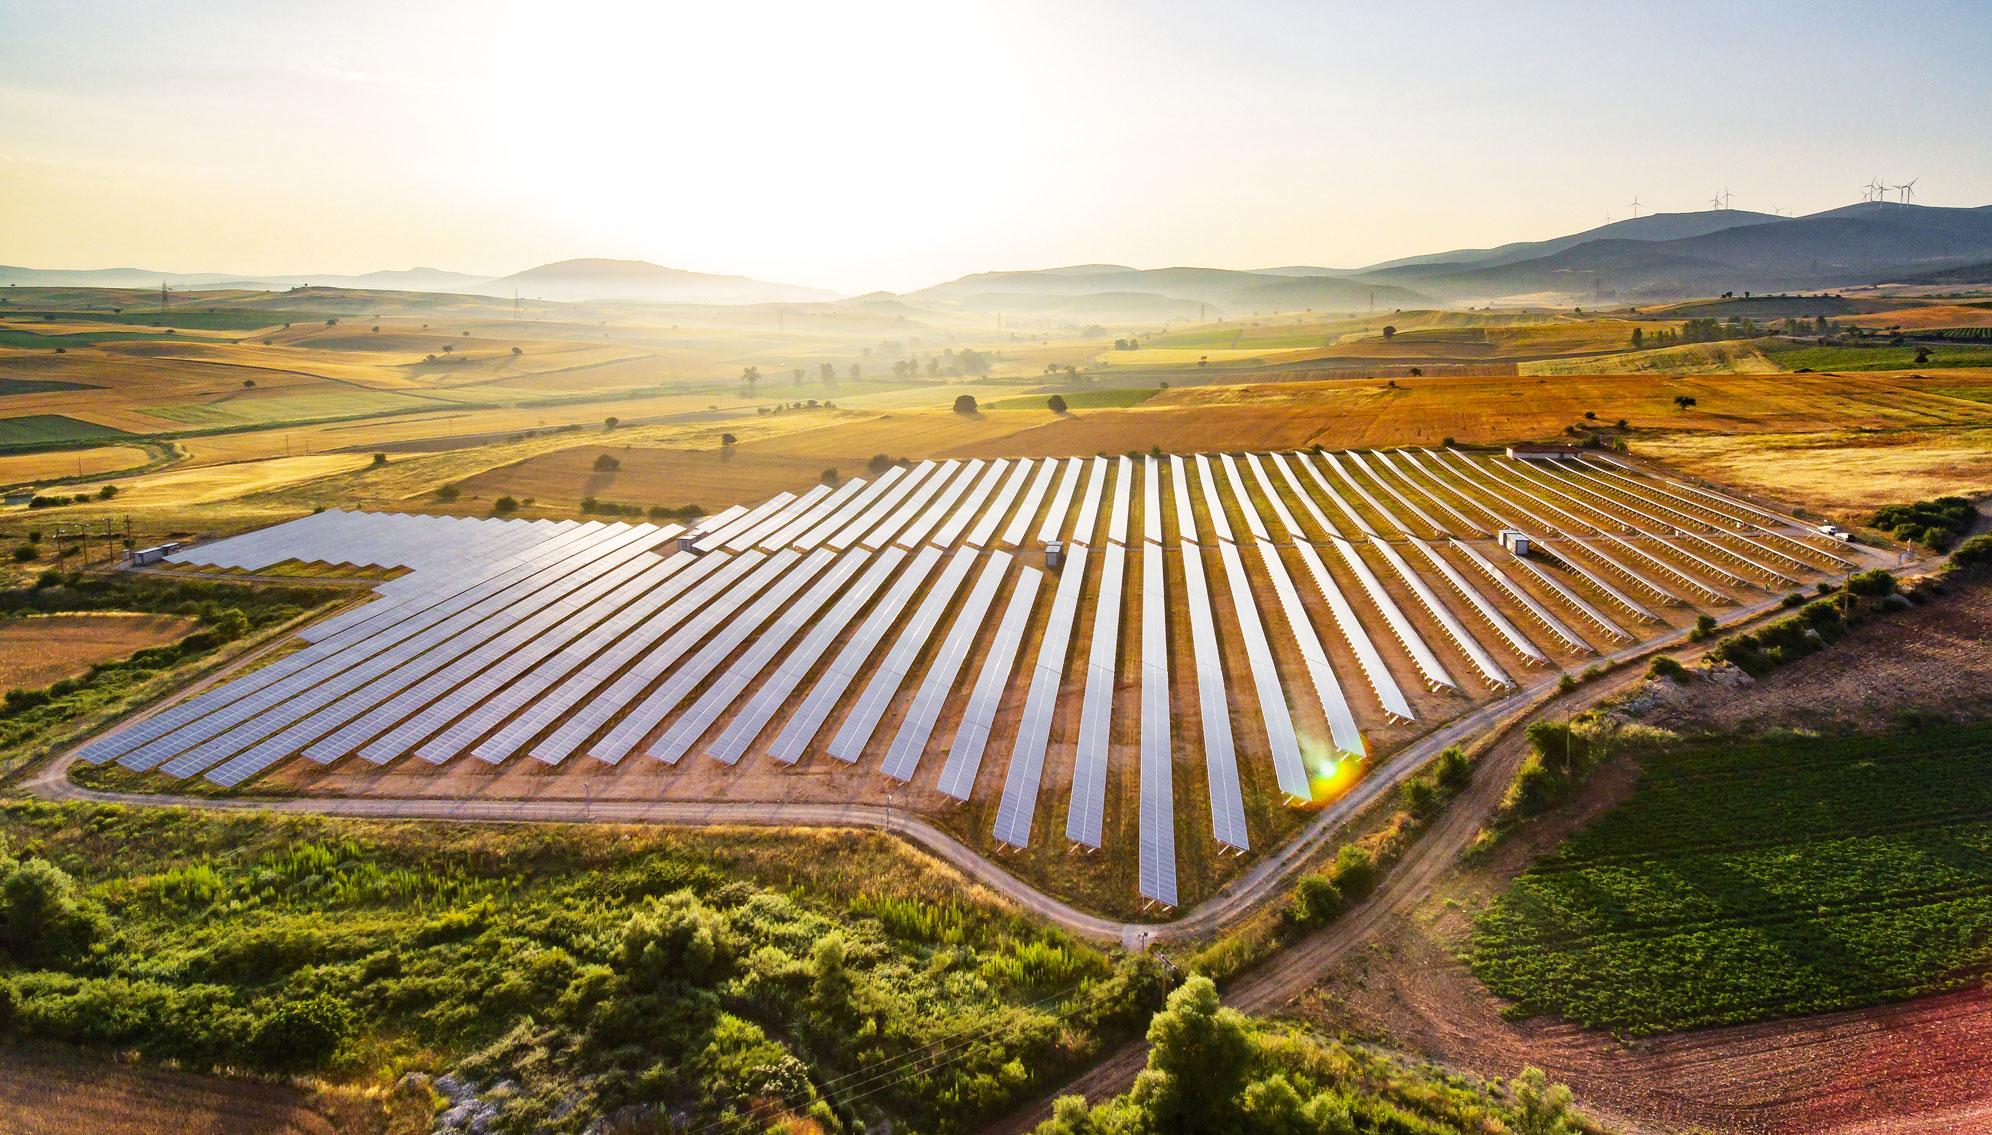 Mytilineos:  Μεγάλες ενεργειακές συμφωνίες σε Ισπανία και Χιλή